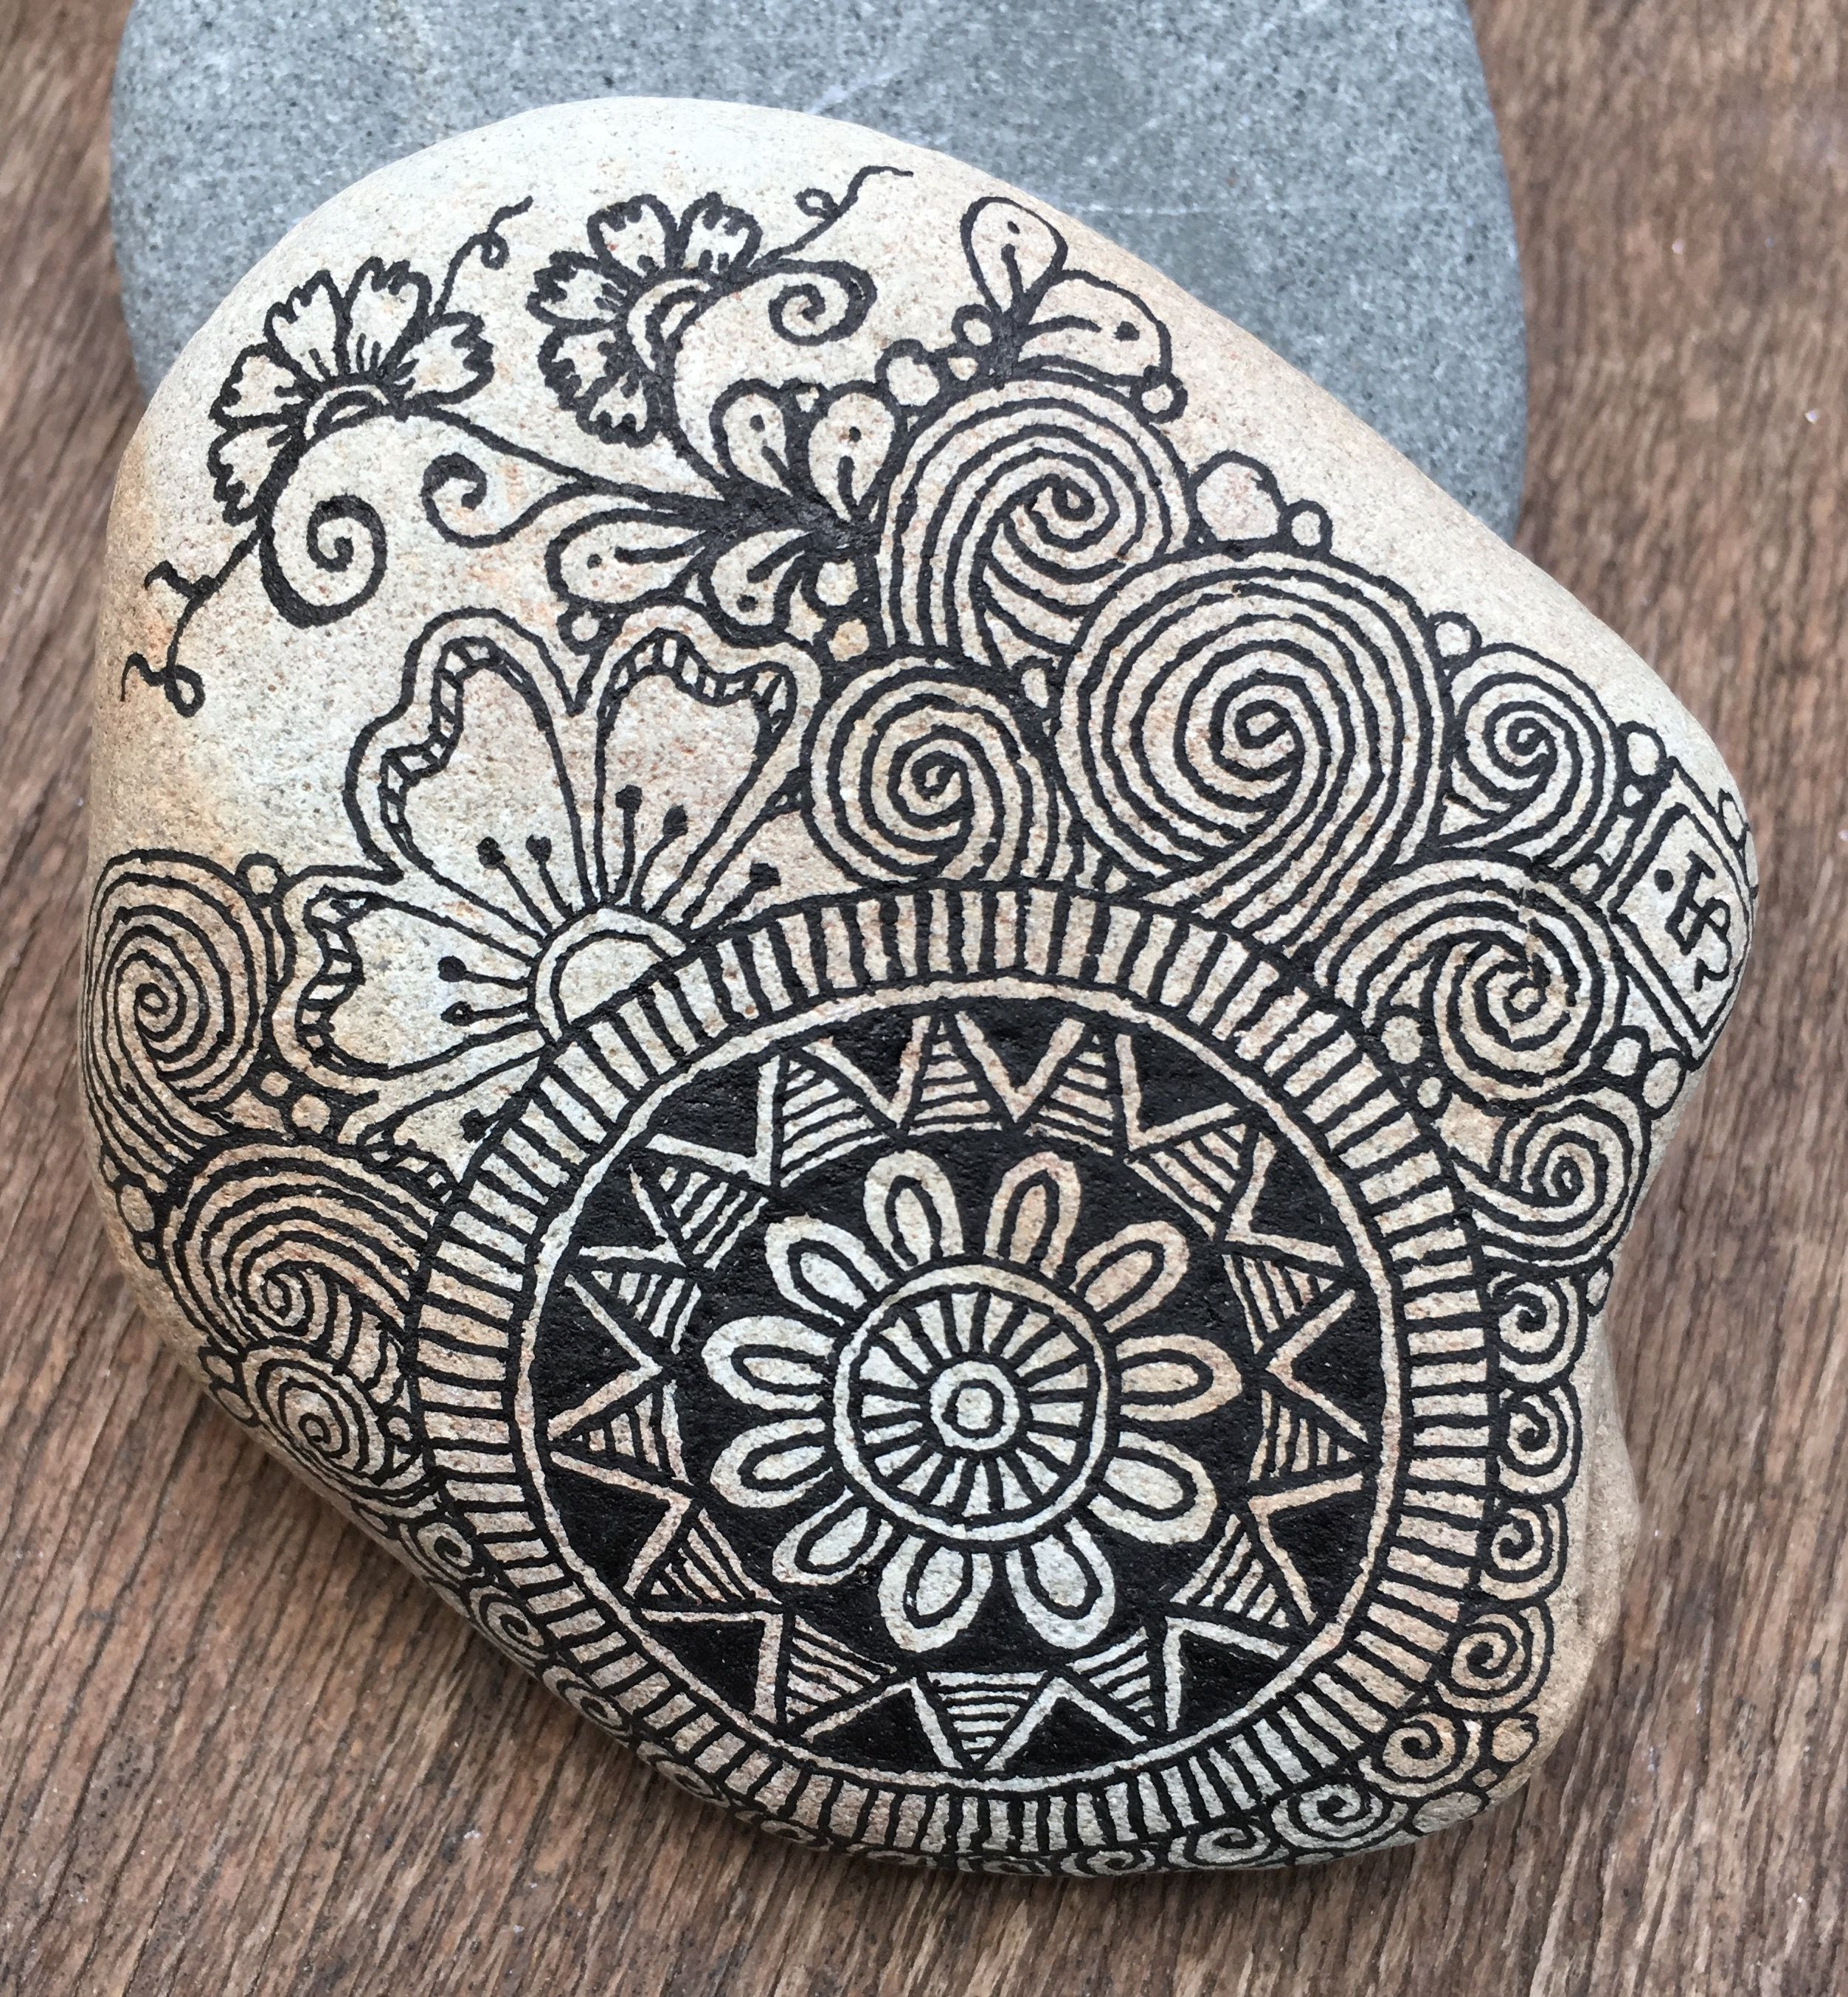 fb razrocks zentangle zia steine deko pinterest steine bemalte steine und steine bemalen. Black Bedroom Furniture Sets. Home Design Ideas